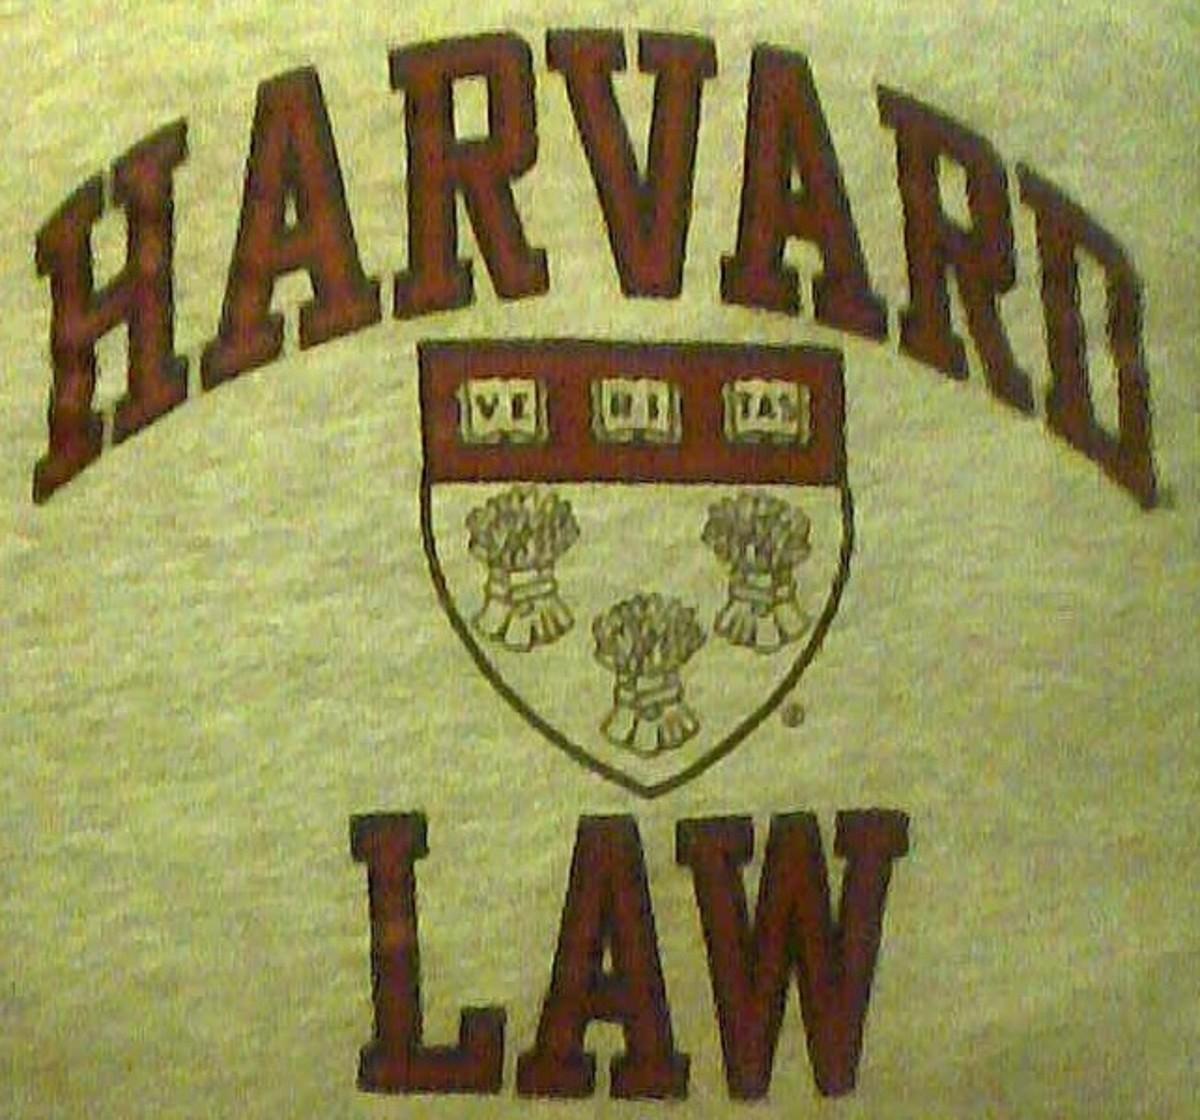 A Harvard Law School T-shirt